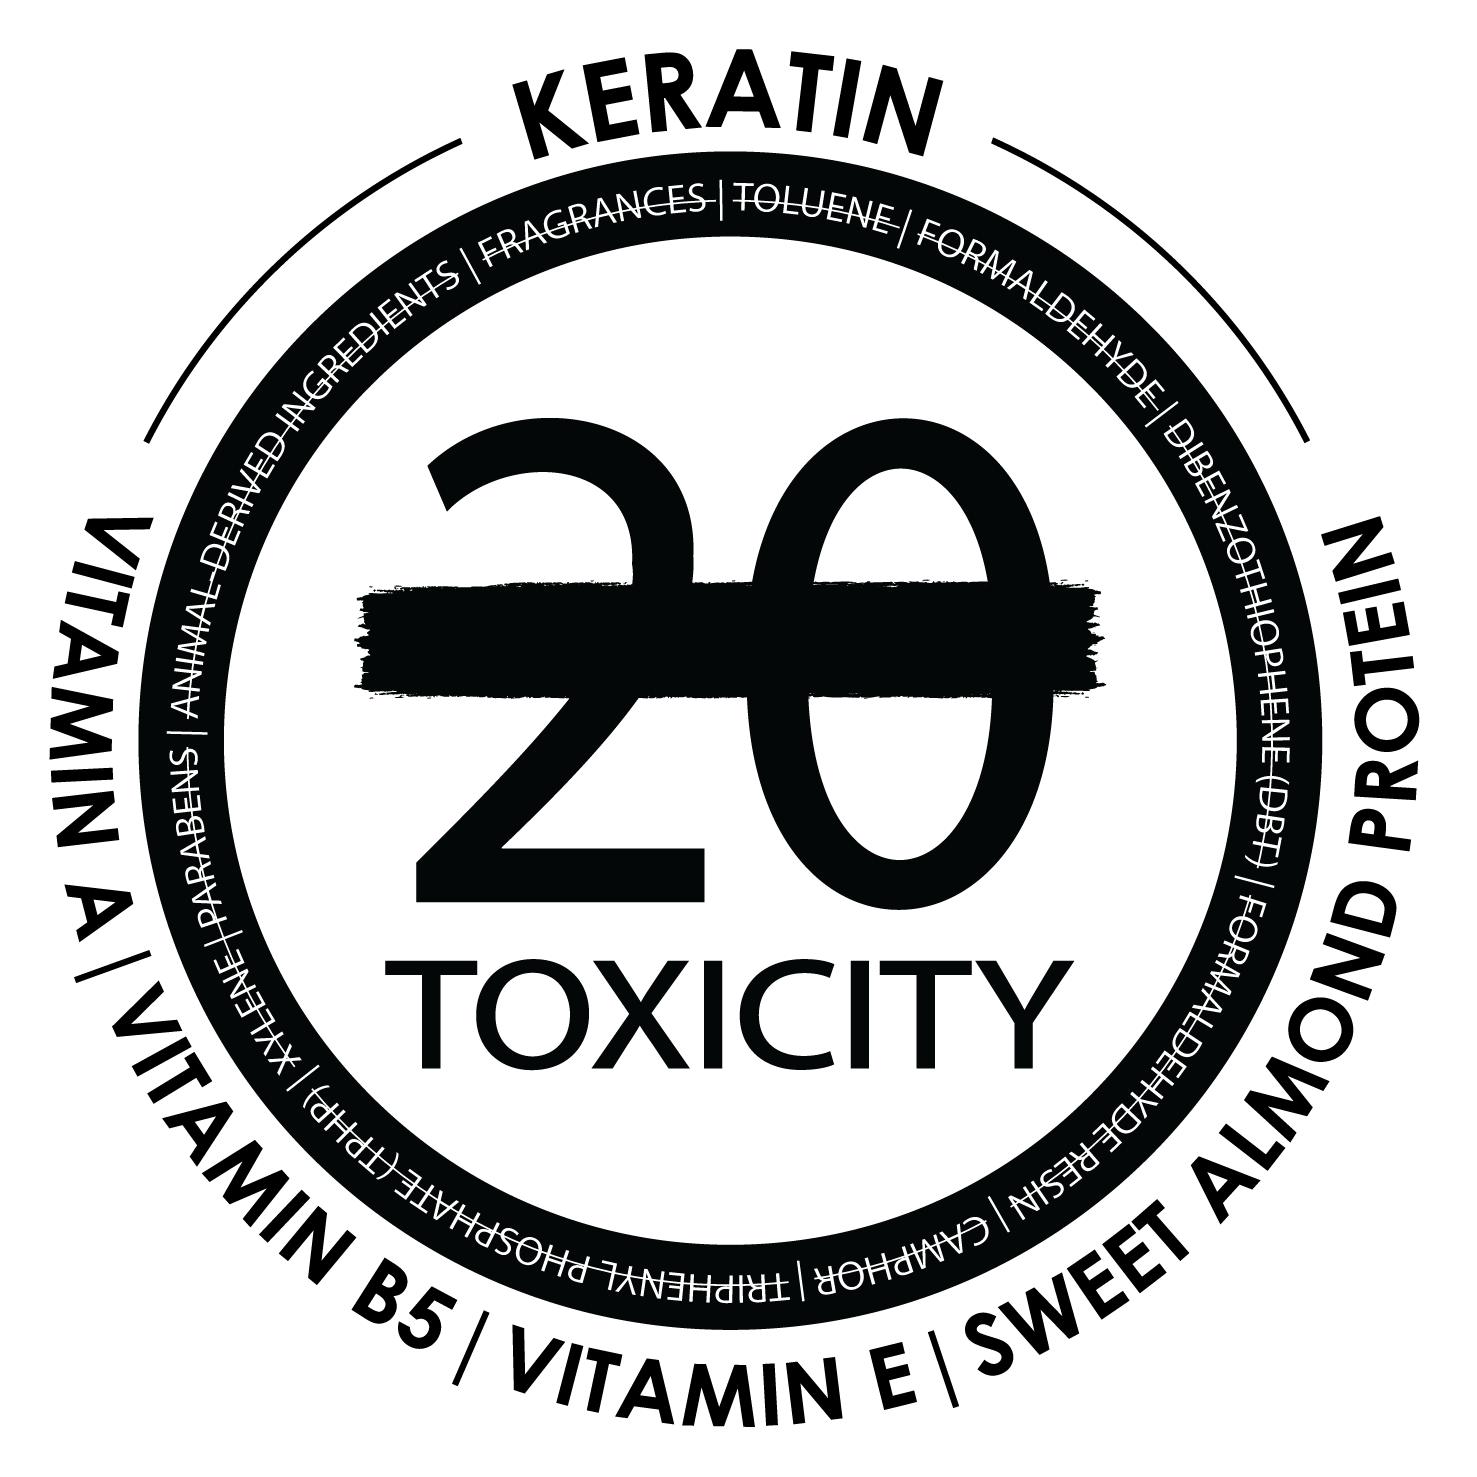 20-TOXICITY LUX PROFESIONÁLNA LINIA